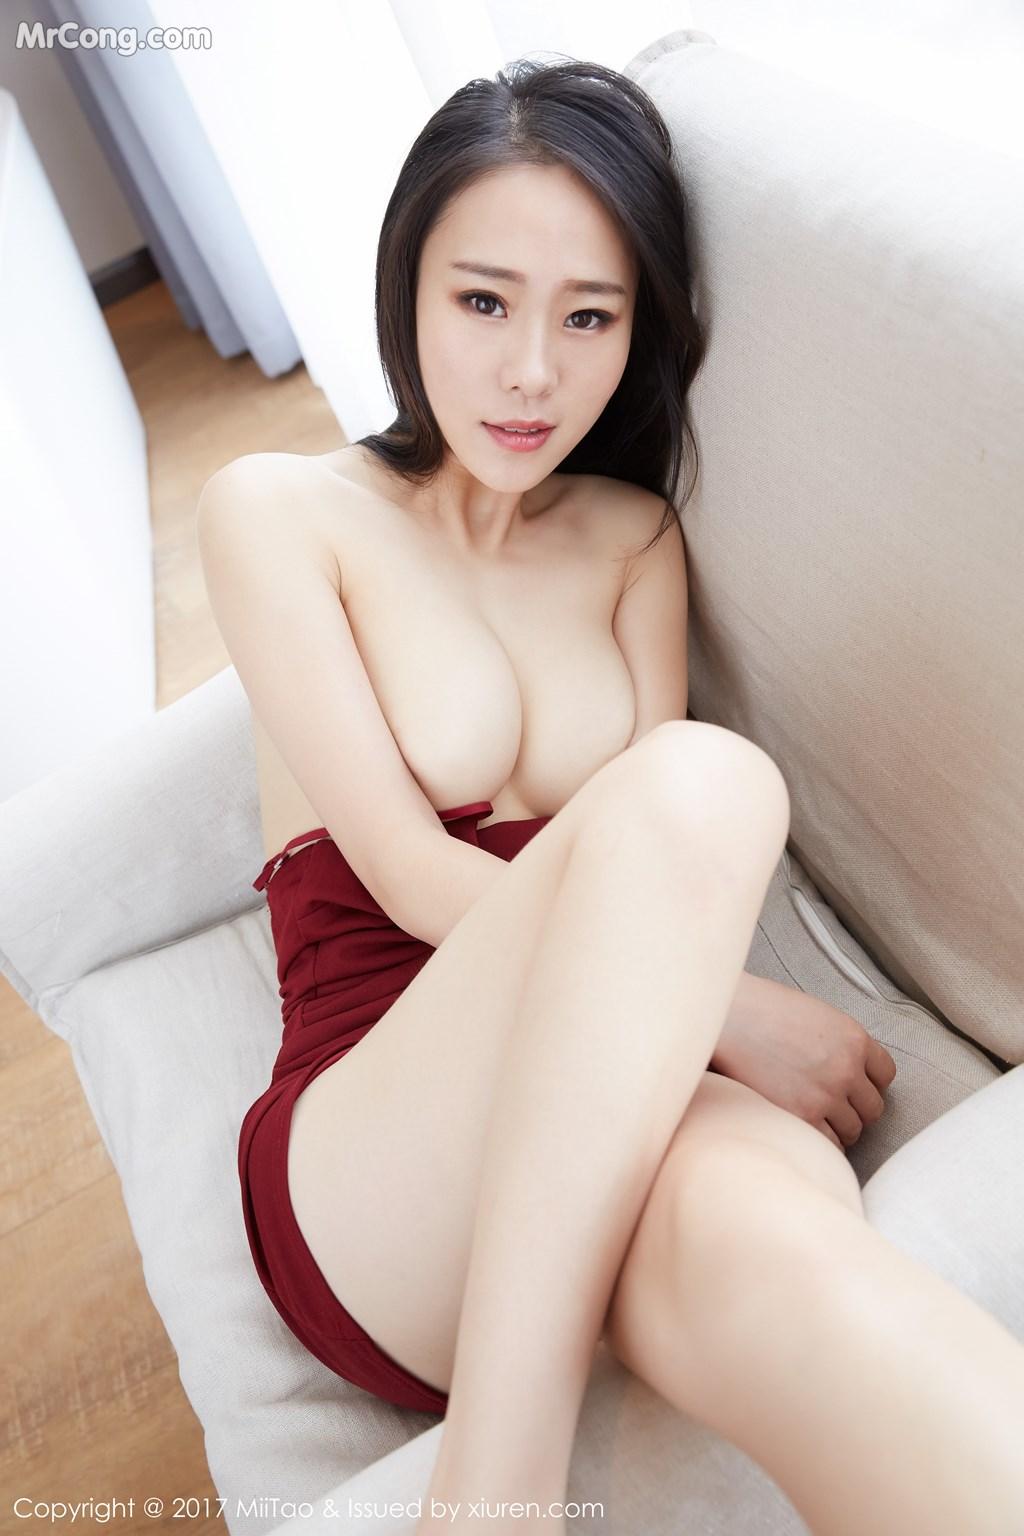 Image MiiTao-Vol.079-Yu-Wei-MrCong.com-022 in post MiiTao Vol.079: Người mẫu Yu Wei (雨薇) (54 ảnh)